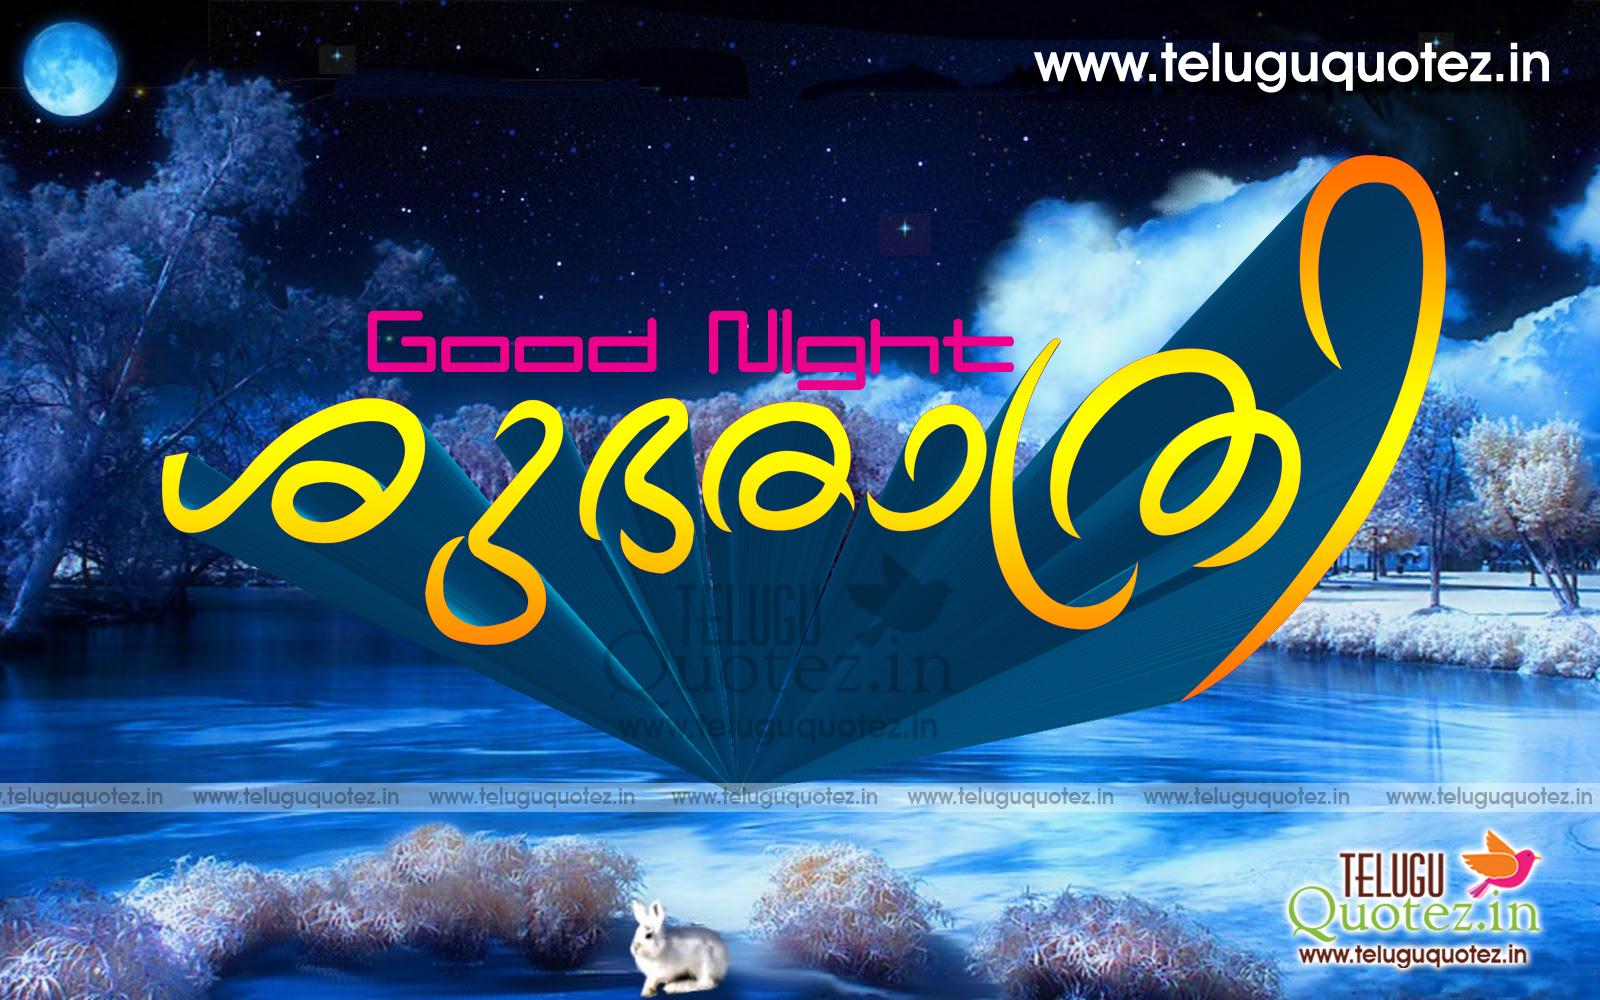 Good Night Quotes In Malayalam Language